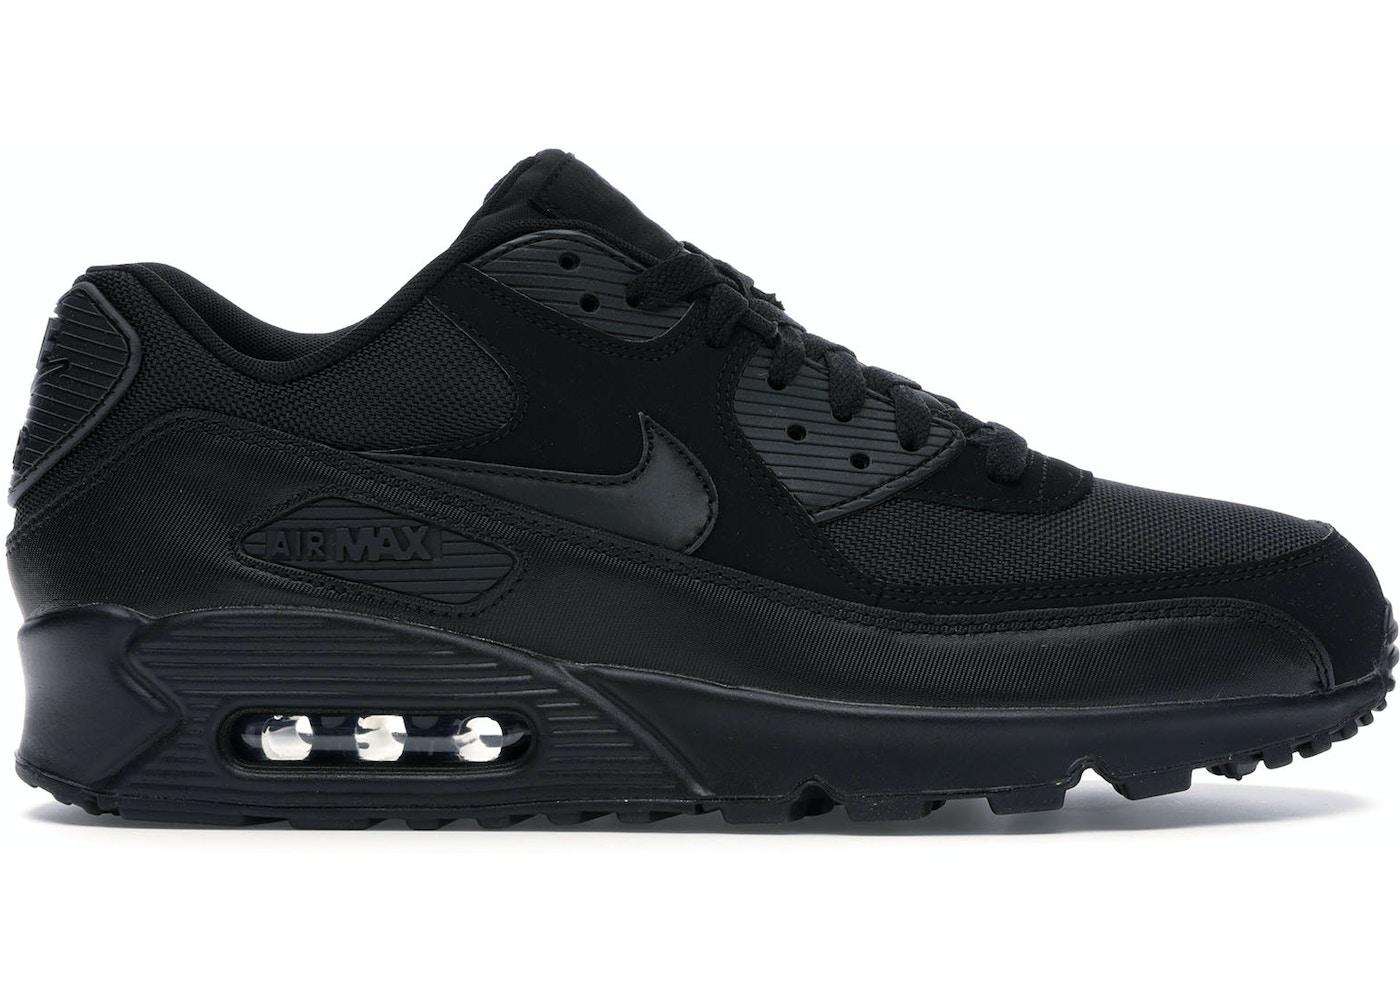 vente chaude en ligne 3549c bc894 Buy Nike Air Max 90 Shoes & Deadstock Sneakers